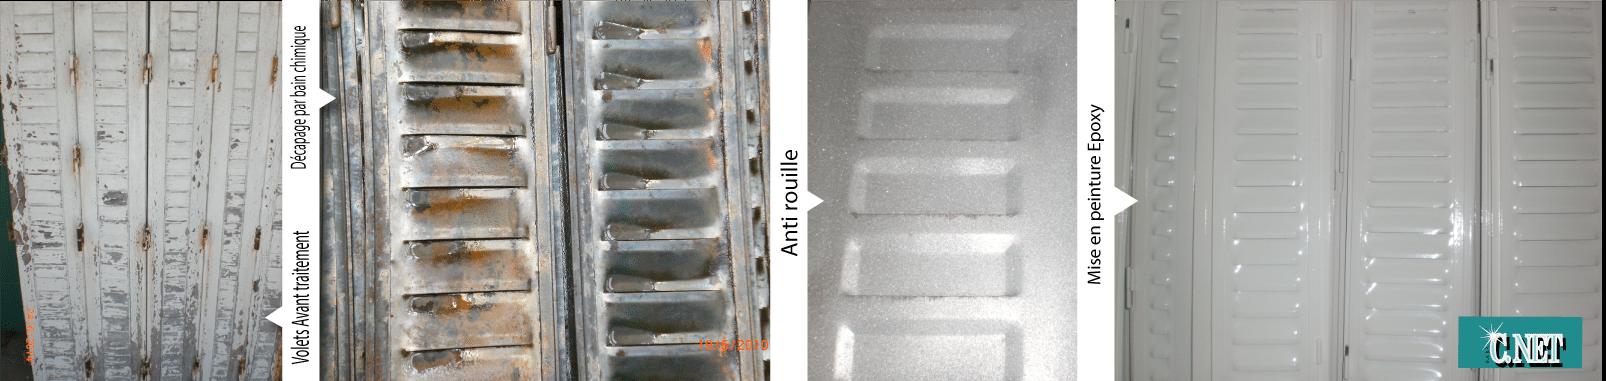 decapage de volets métaliques